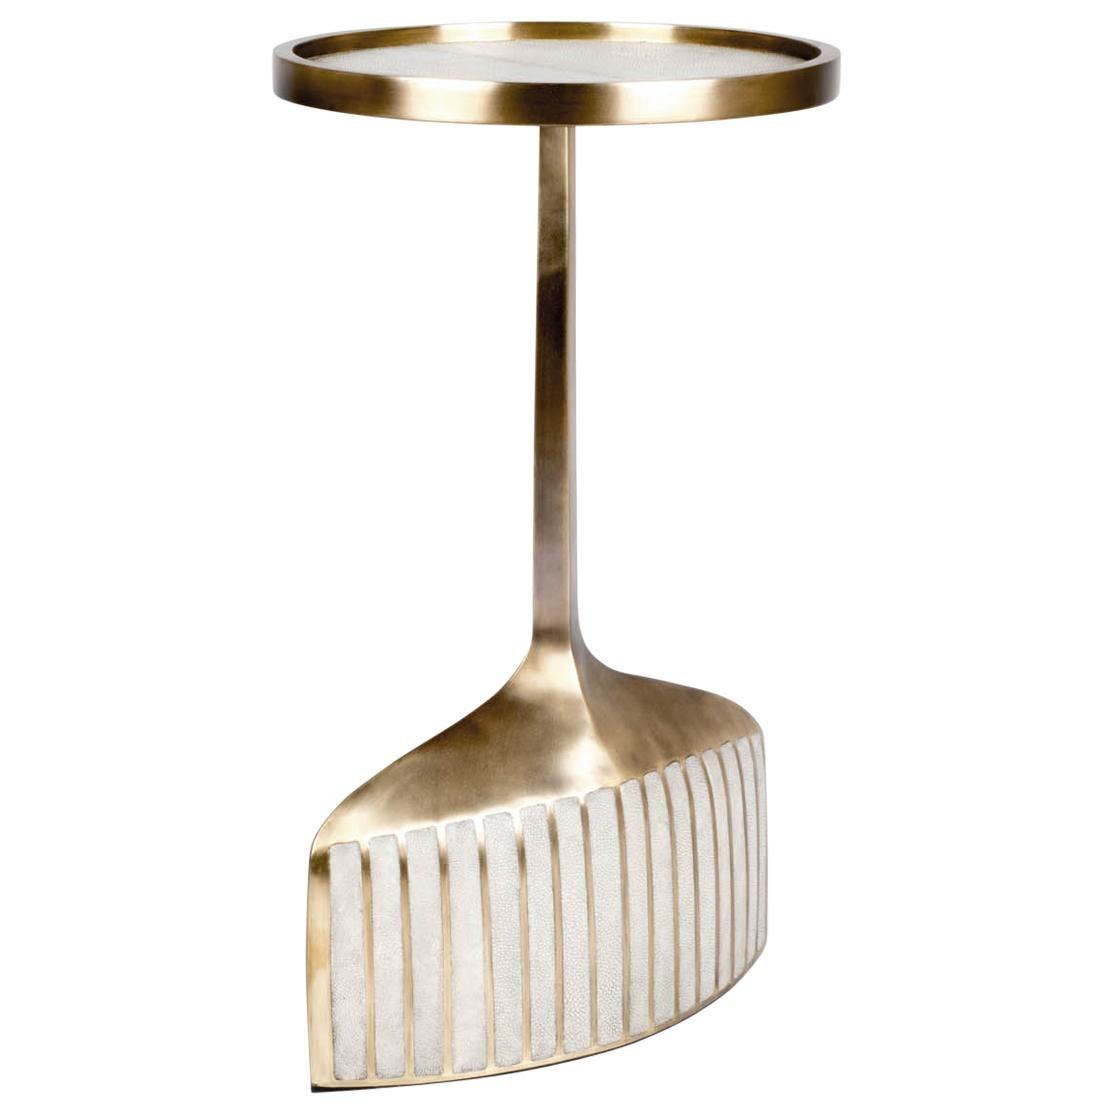 Pedestal Table Small in Cream Shagreen & Brass by R & Y Augousti